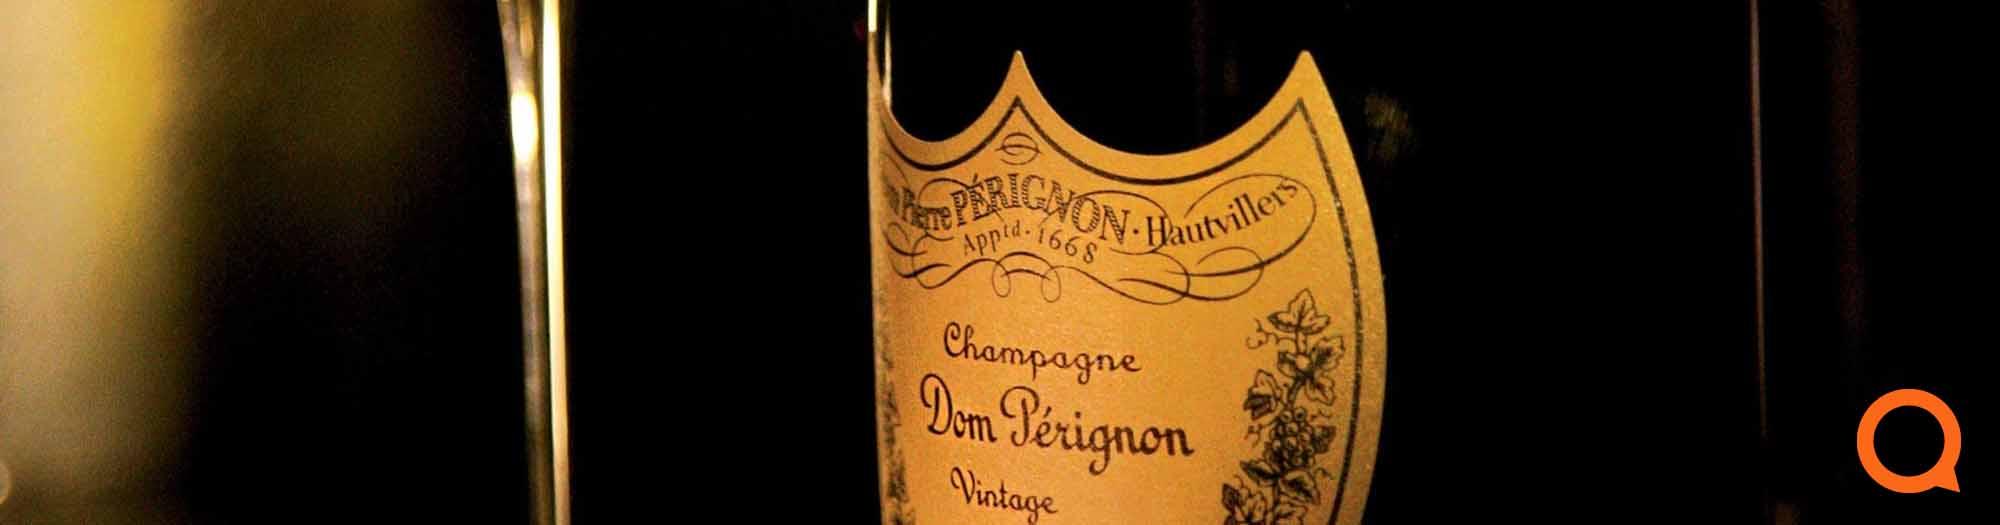 Champagne pakketten